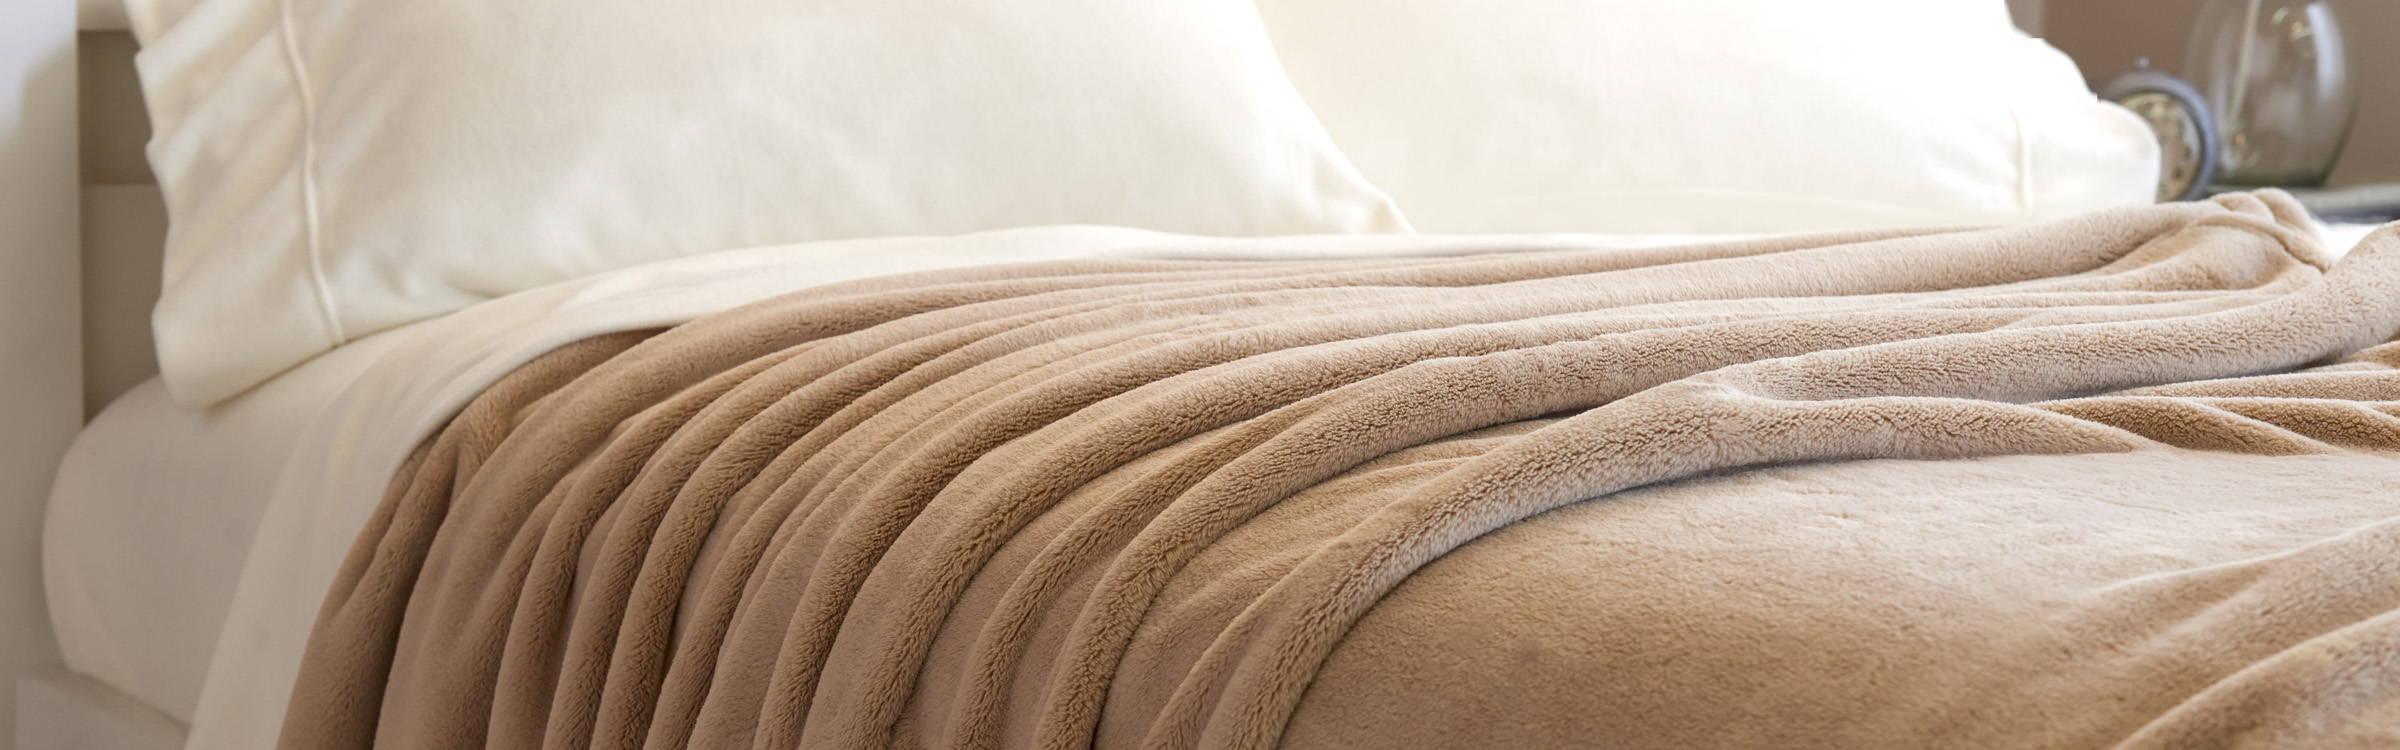 PrimaLush Bed Blanket